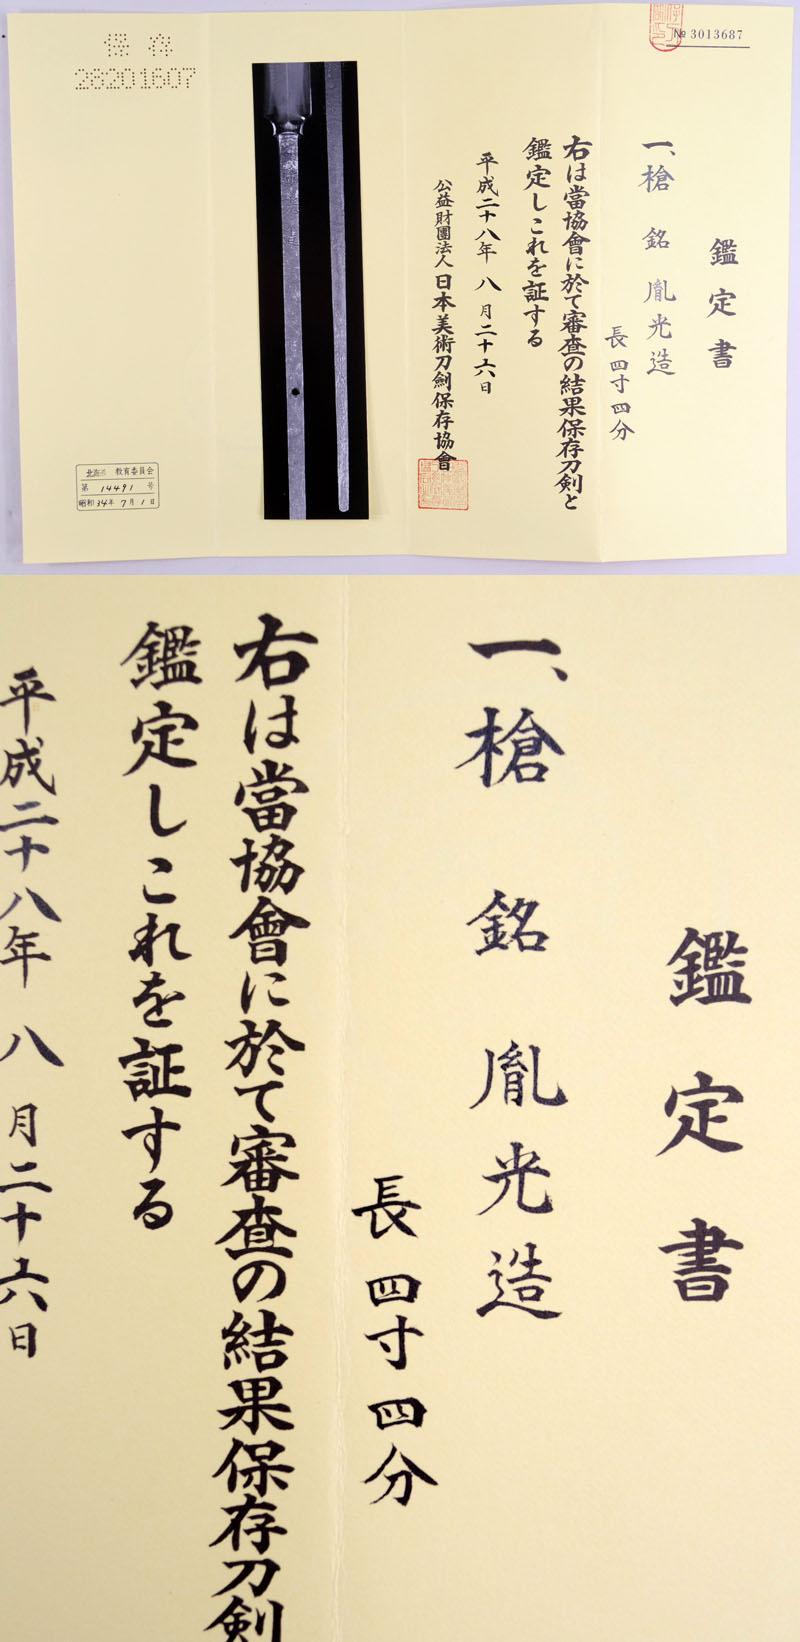 胤光造(心慶胤光) Picture of Certificate